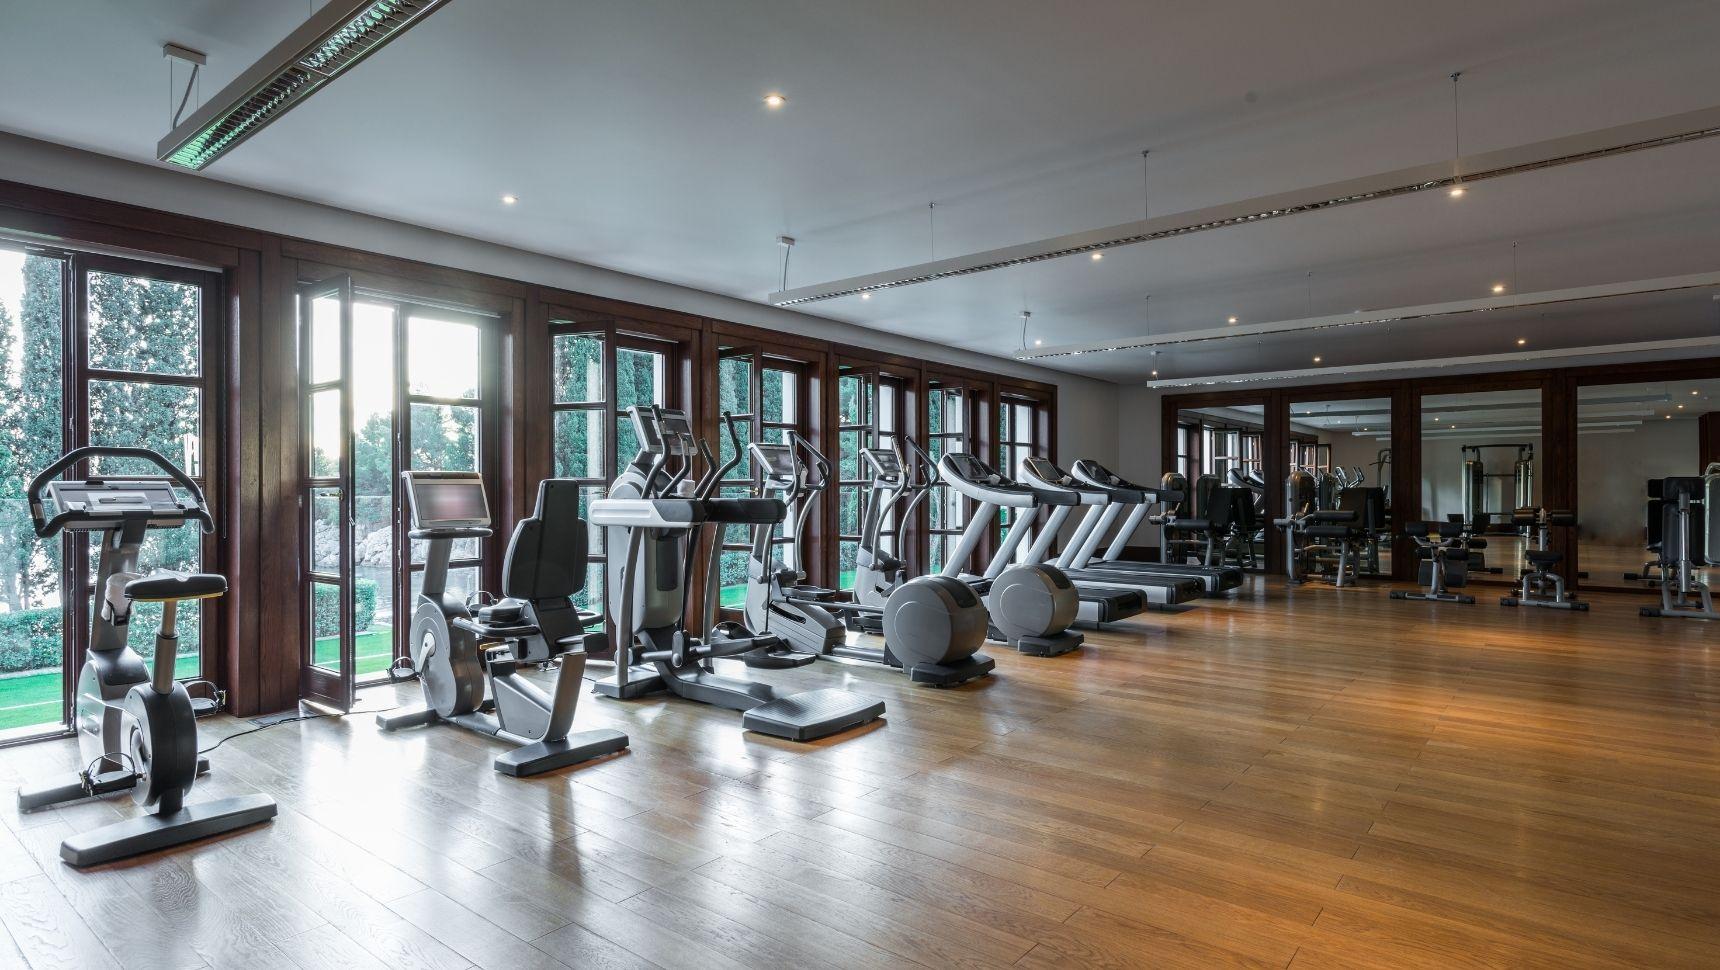 https://aktiv-gesund-fitness.de/fitnessstudio-kostheim